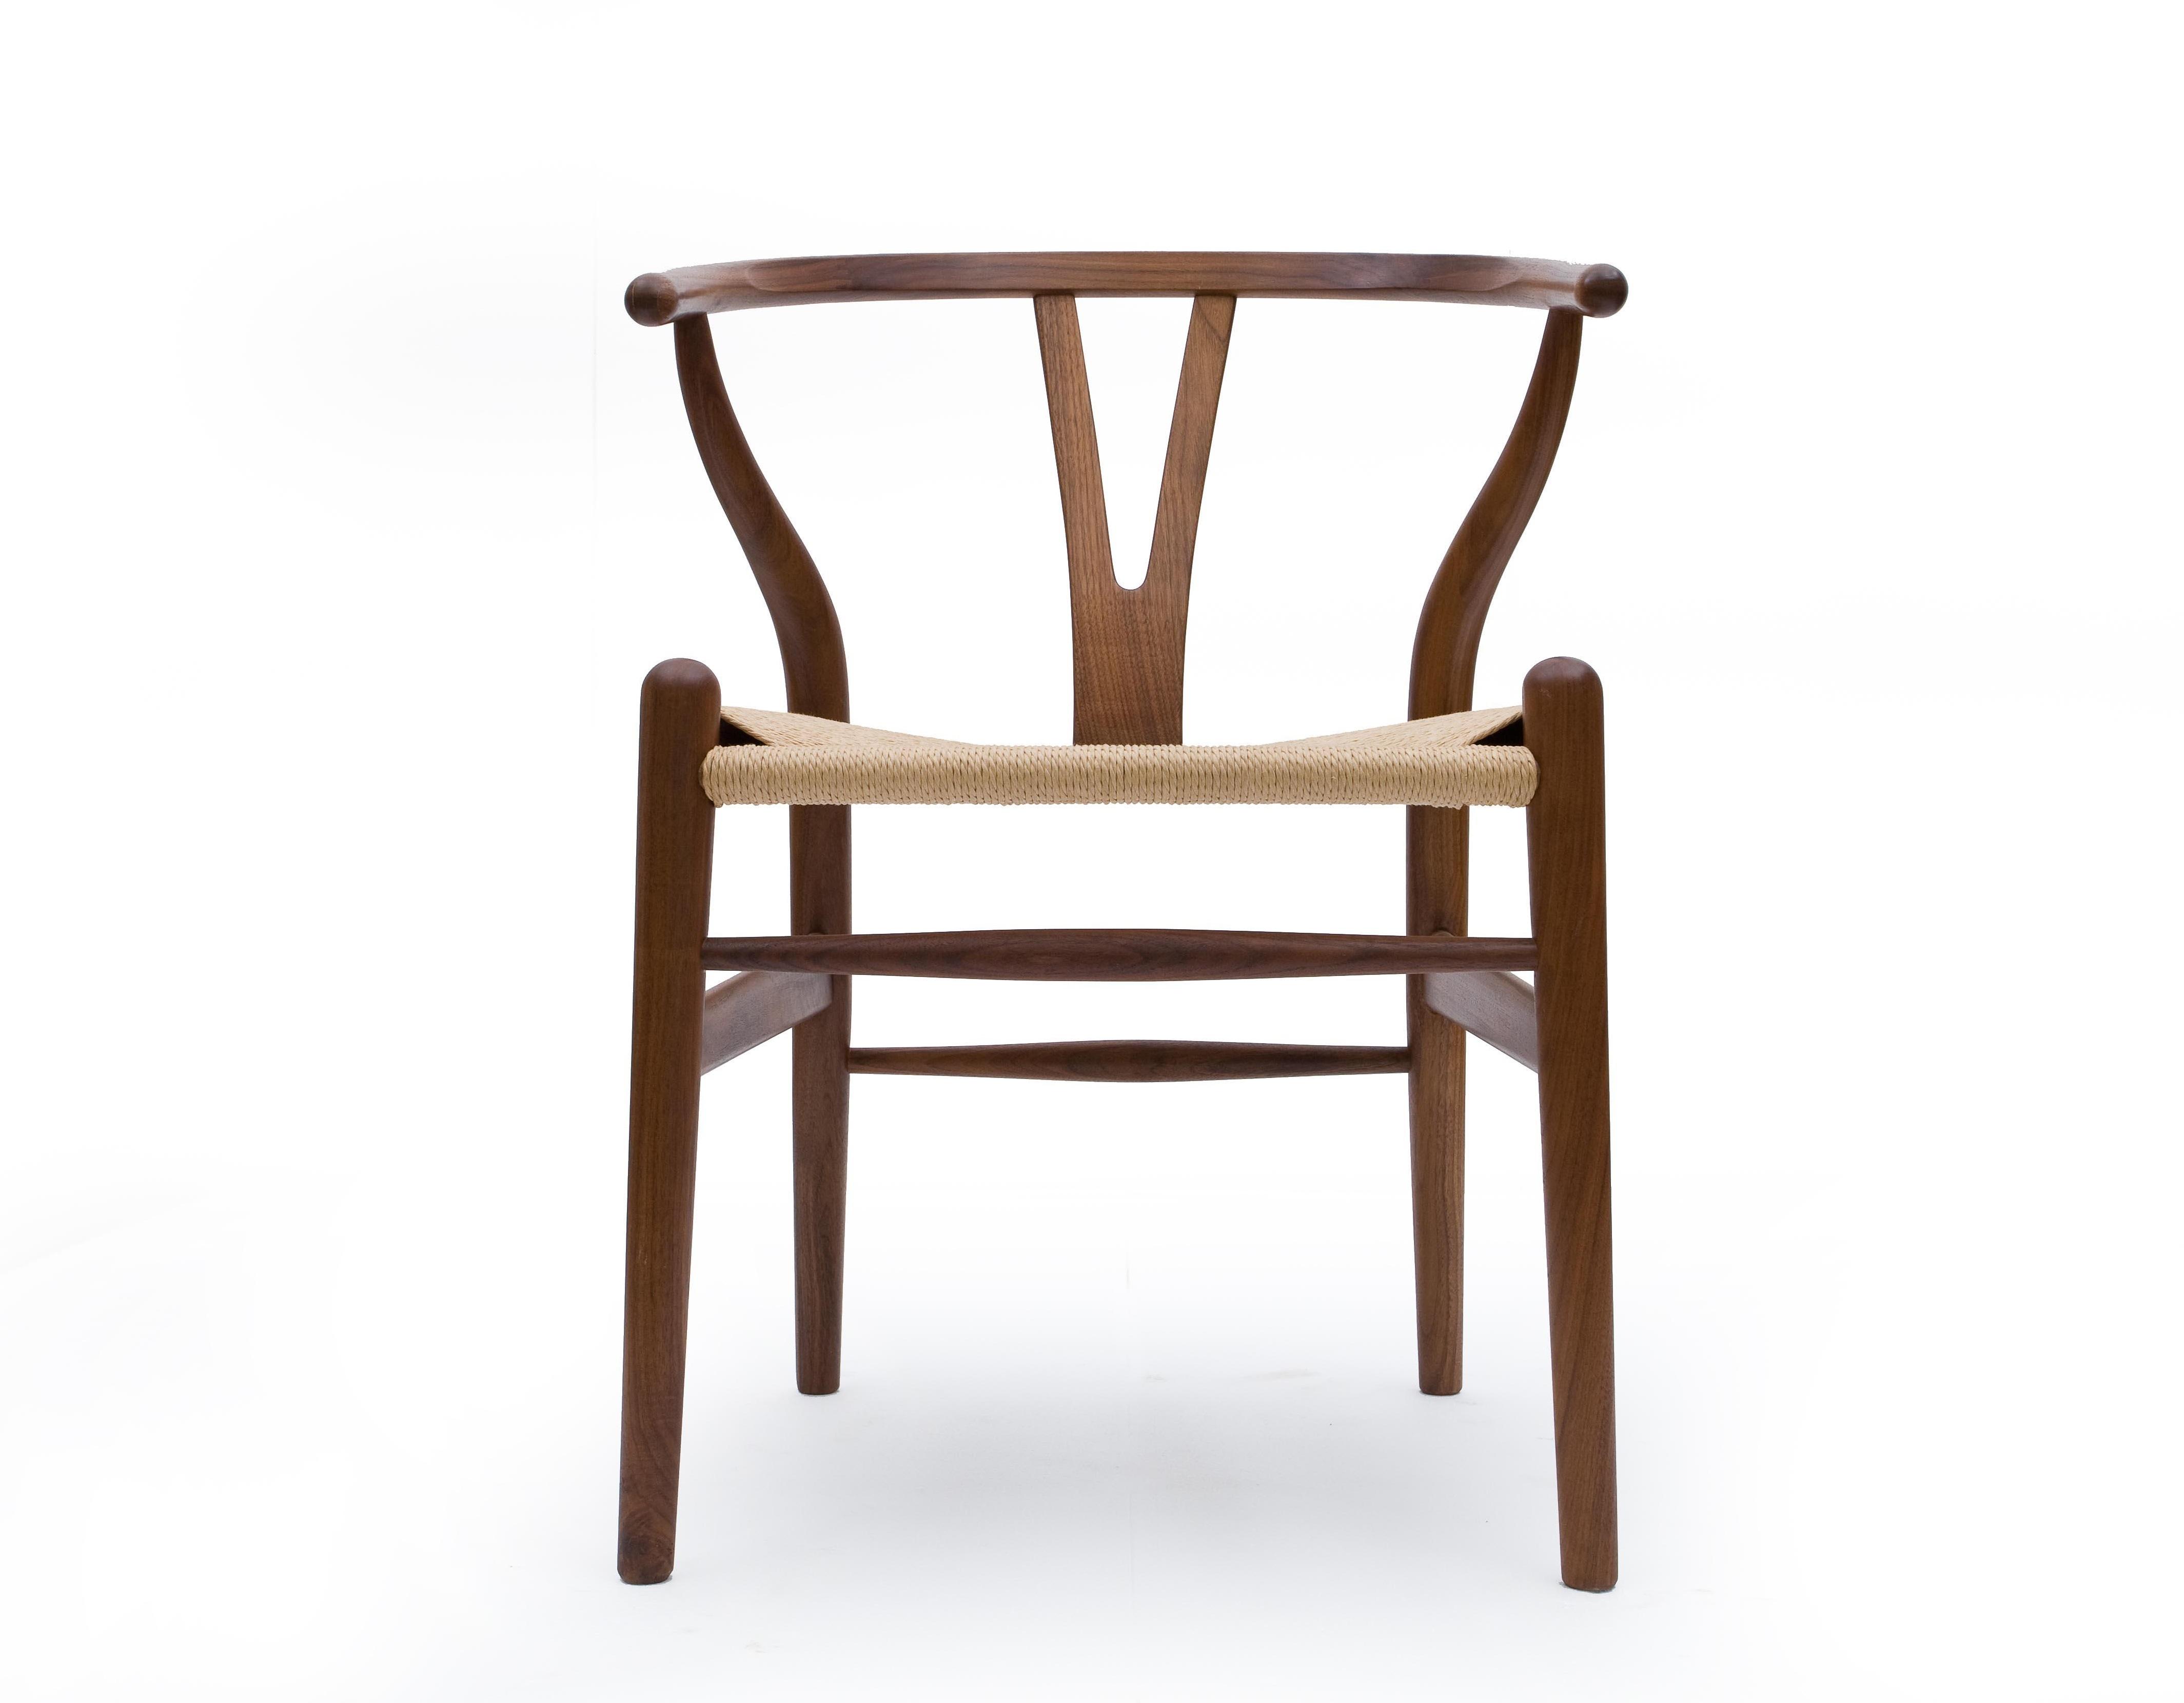 Designed by Hans J. Wegner (1949) 570x540x750 mm Beechwood, papyrus fibers Price-2.990.000 VND